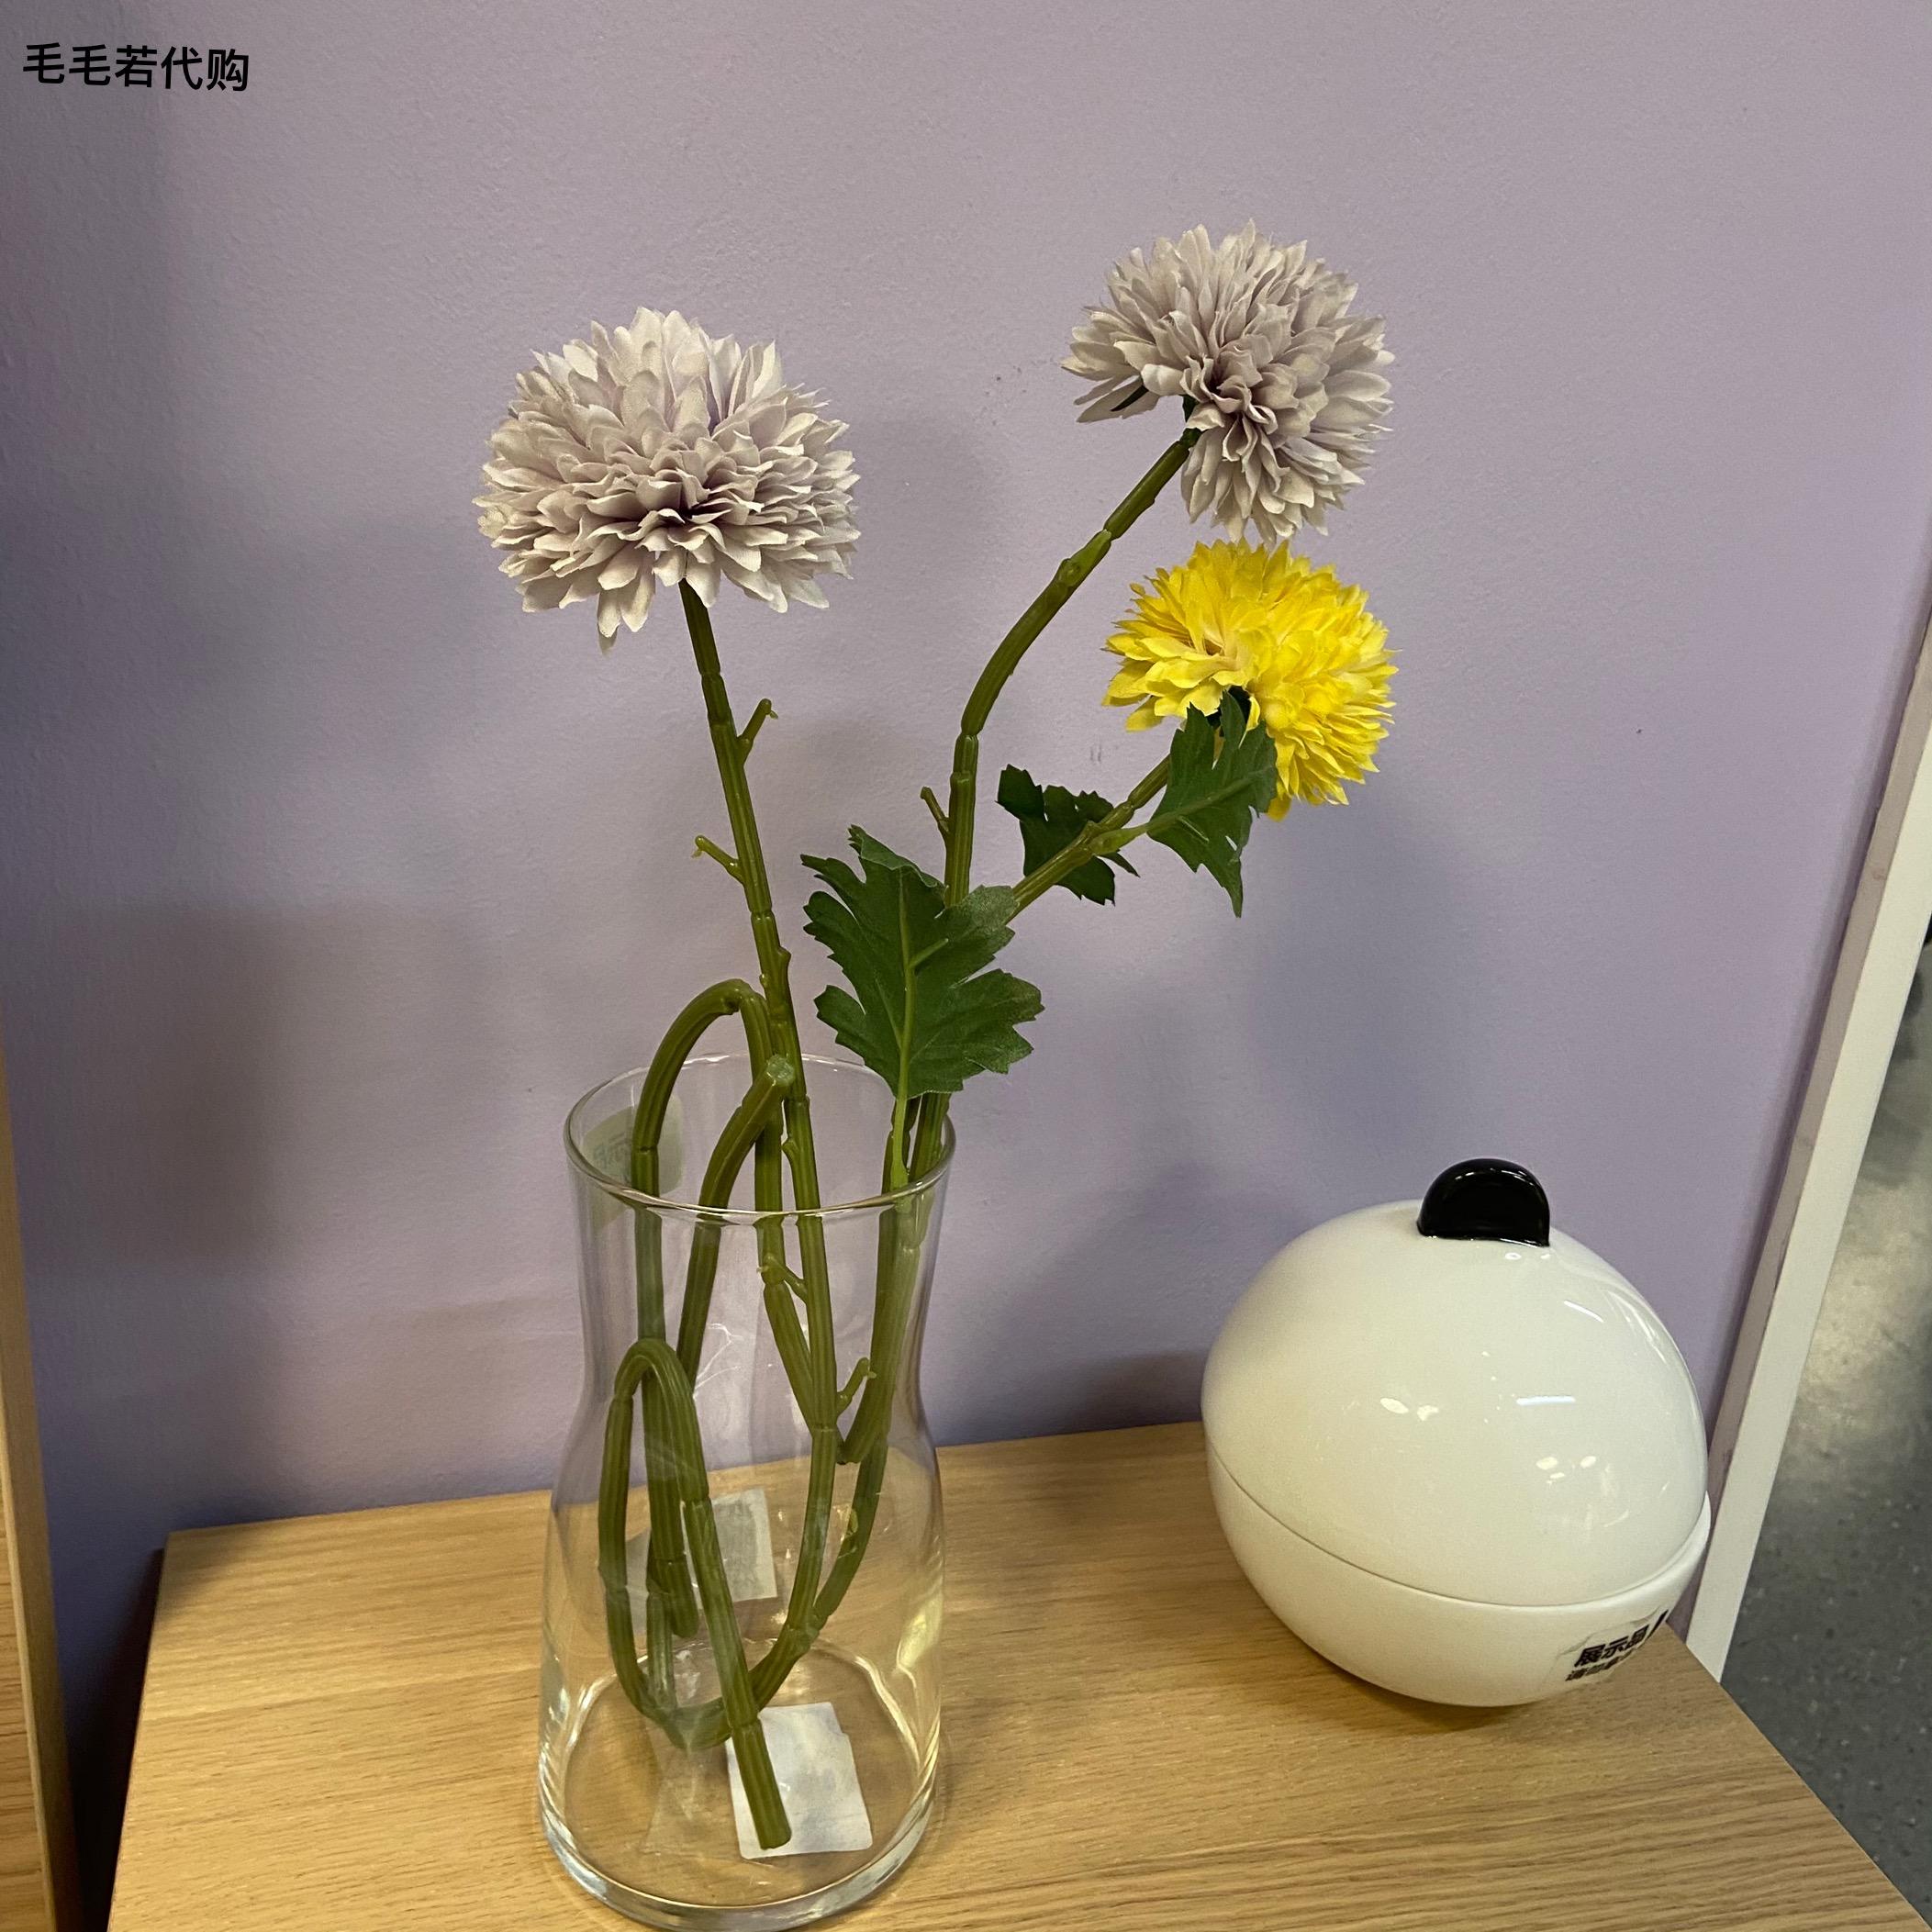 花瓶 ikea